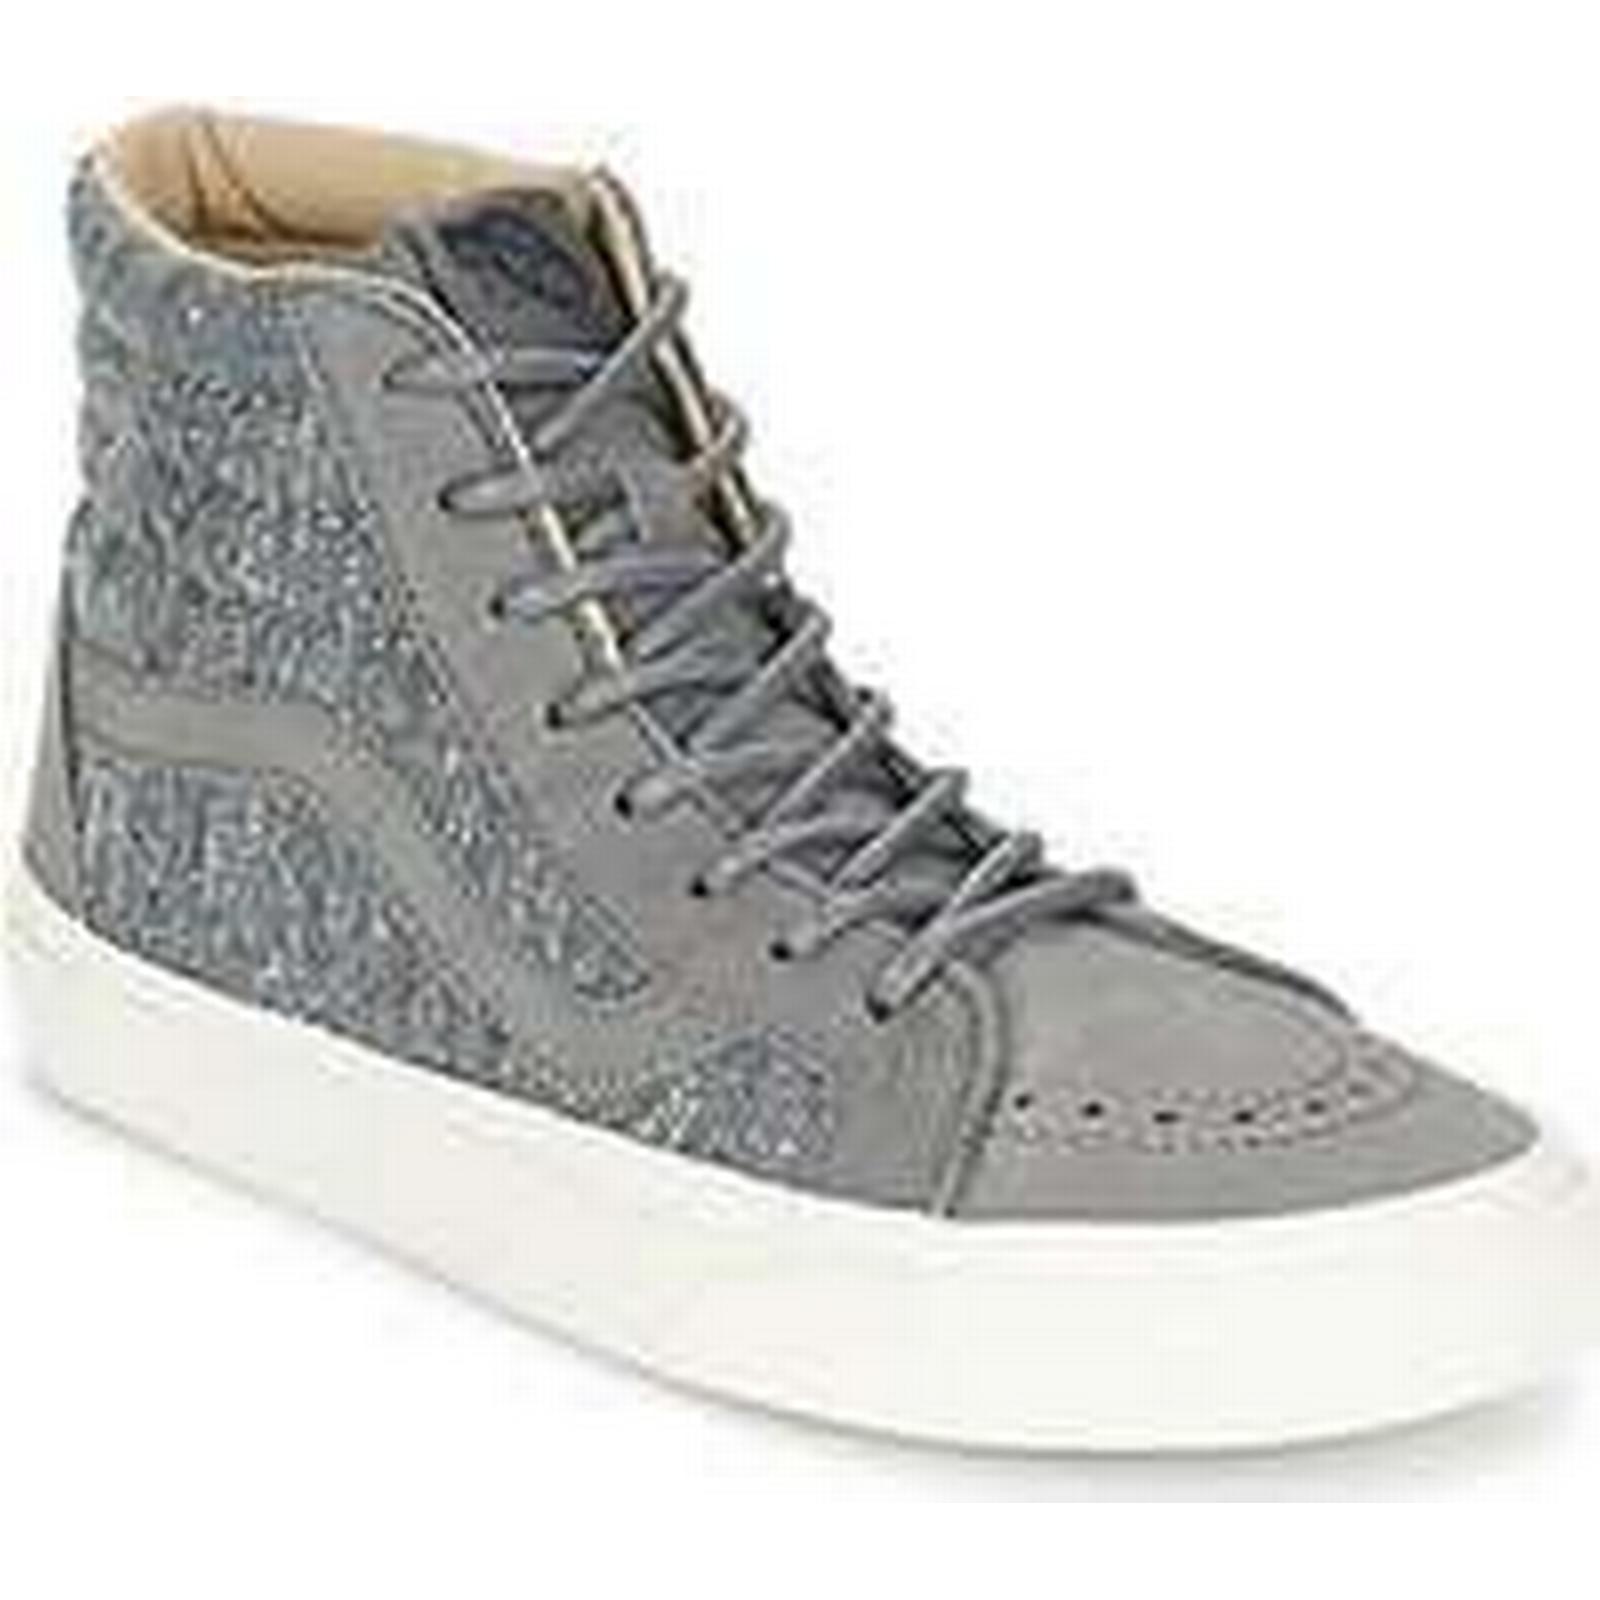 45a6fc6d3 Spartoo.co.uk -Vans-SK8-HI-REISSUE-DX-men-s-Shoes-(High-top-Trainers)-in-Grey.jpg